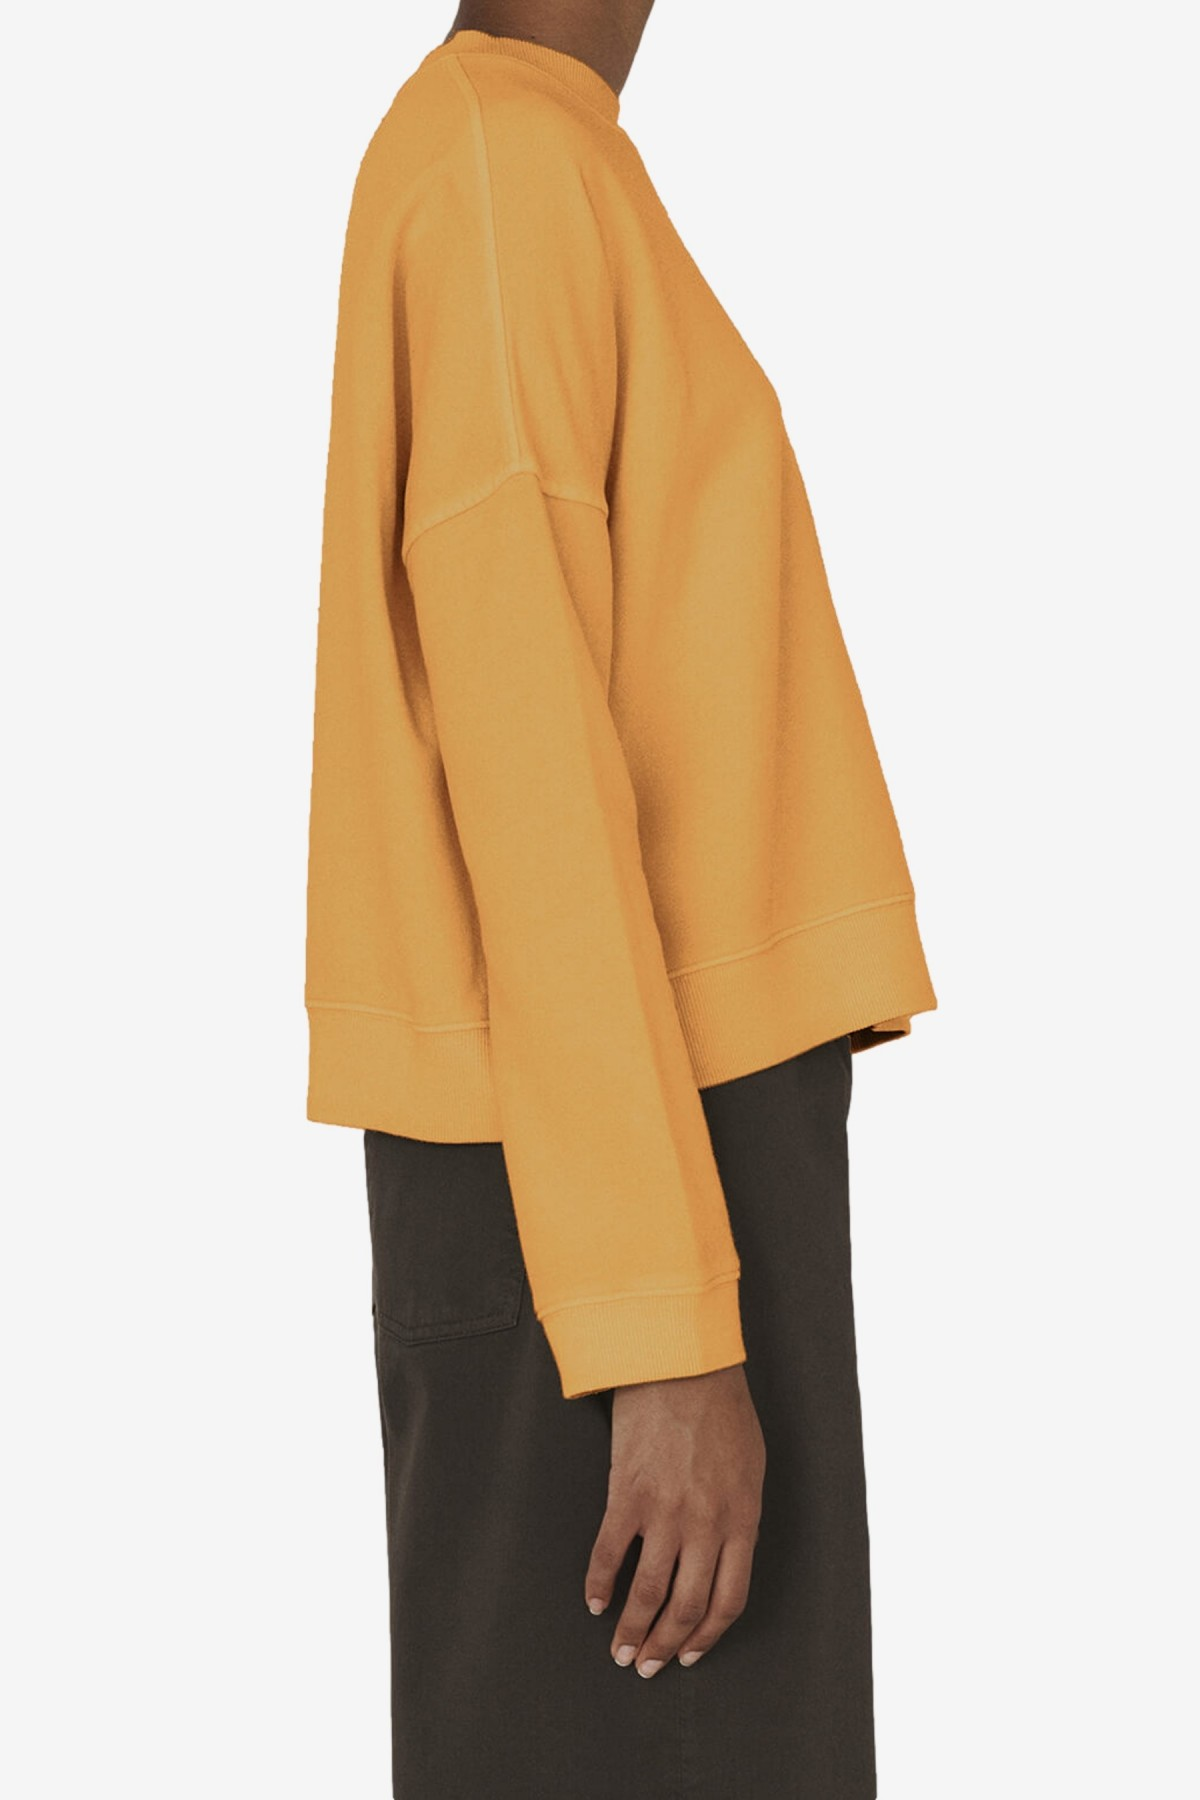 YMC You Must Create Almost Grown Sweatshirt in Yellow